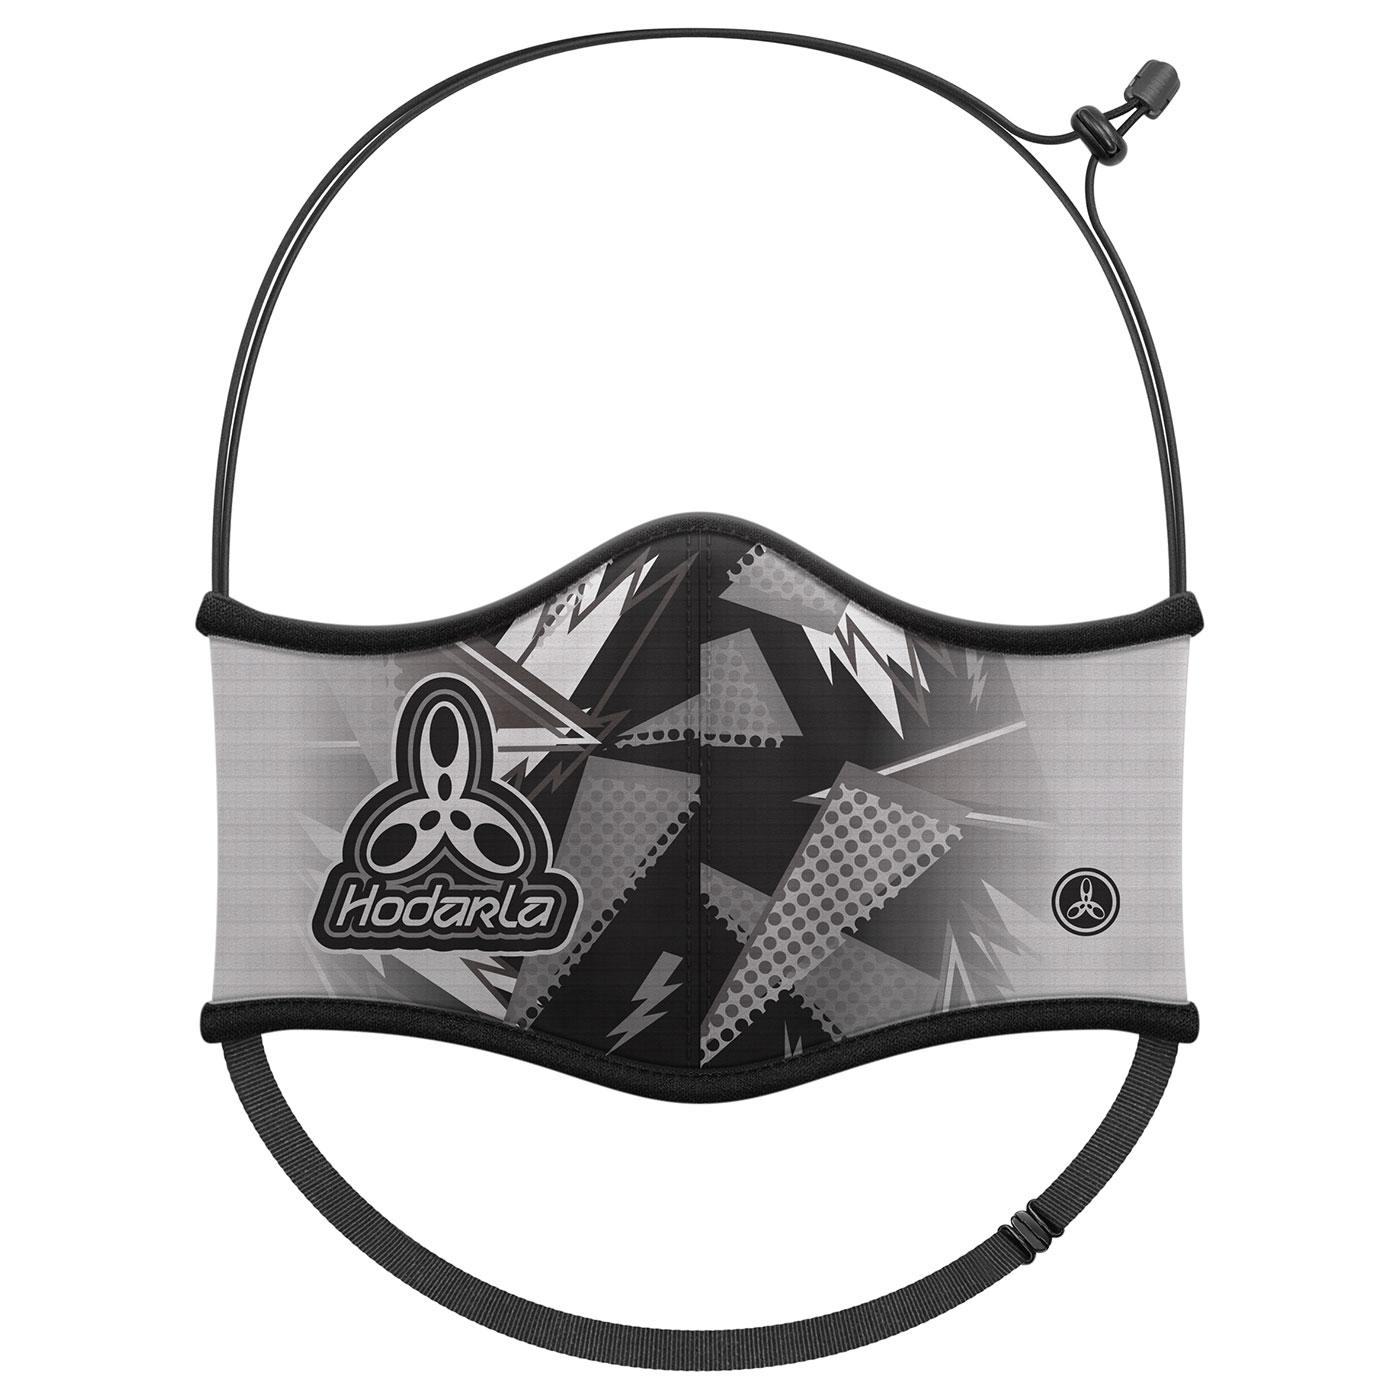 HODARLA AIR 運動舒適口罩 6032249 - 黑白棕